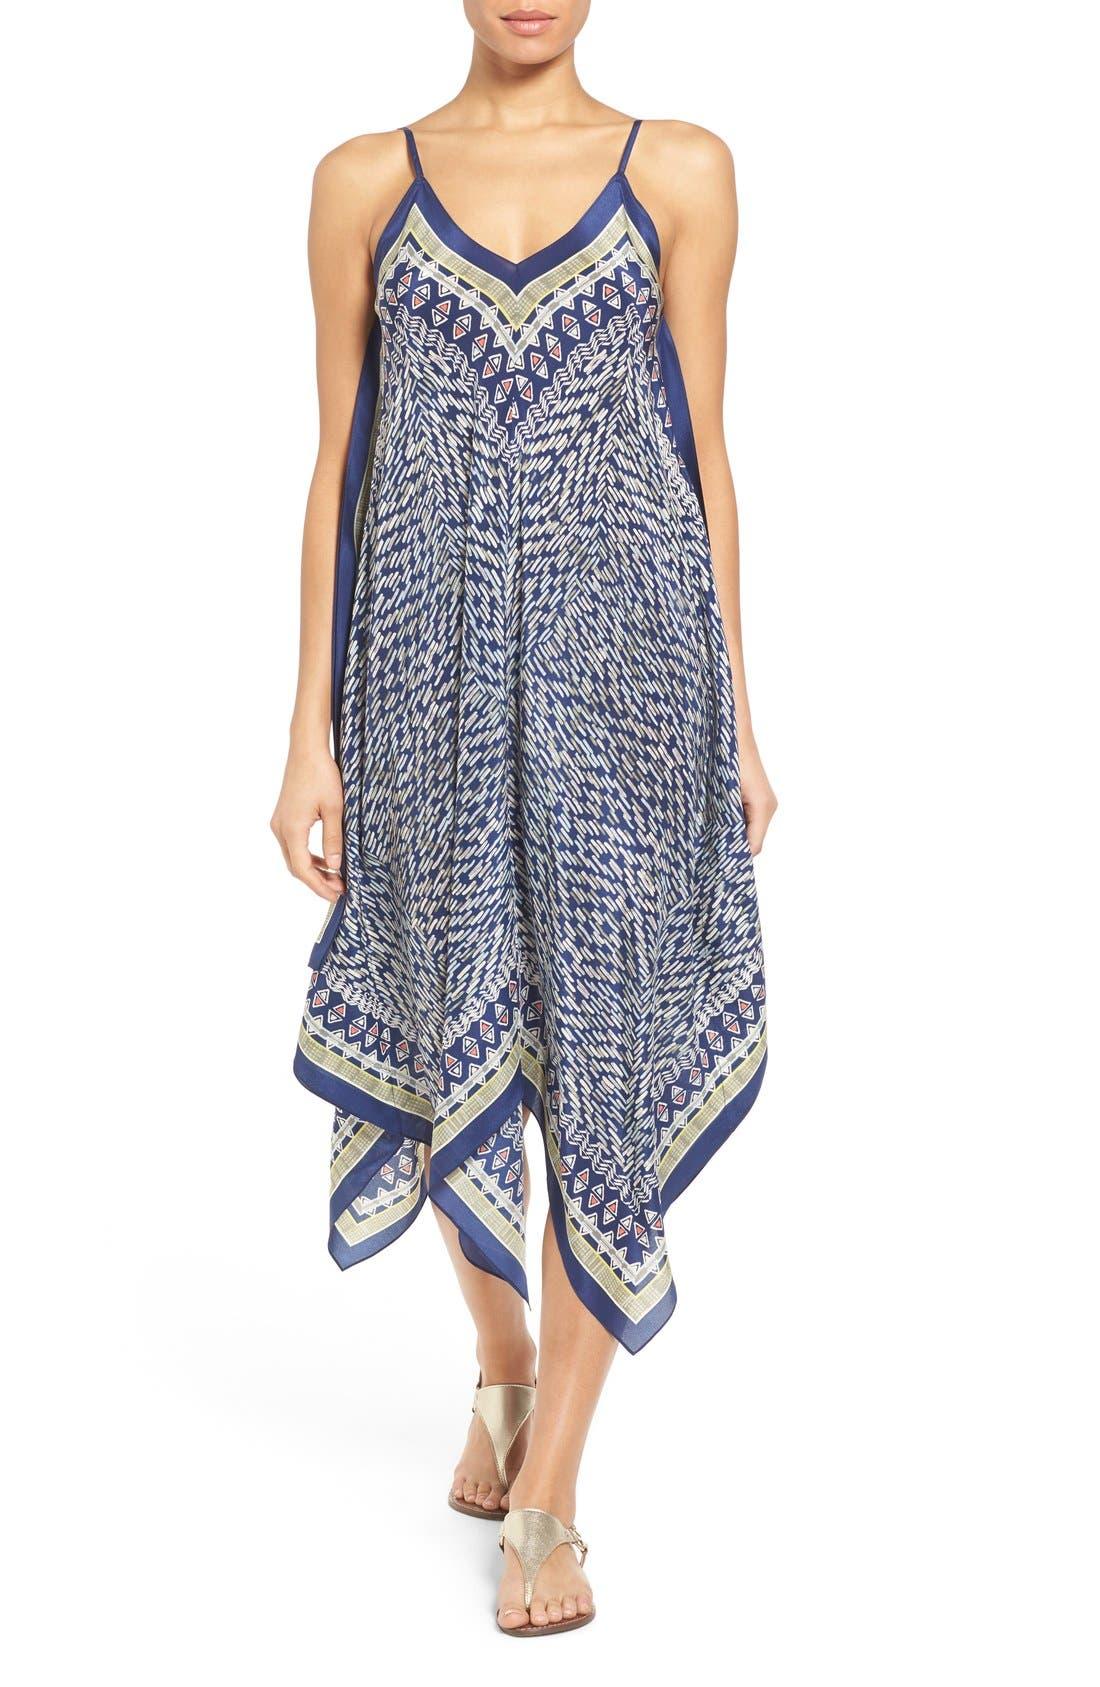 Alternate Image 1 Selected - NIC+ZOE 'Tropicale' Print Handkerchief Hem Silk Sundress (Regular & Petite)